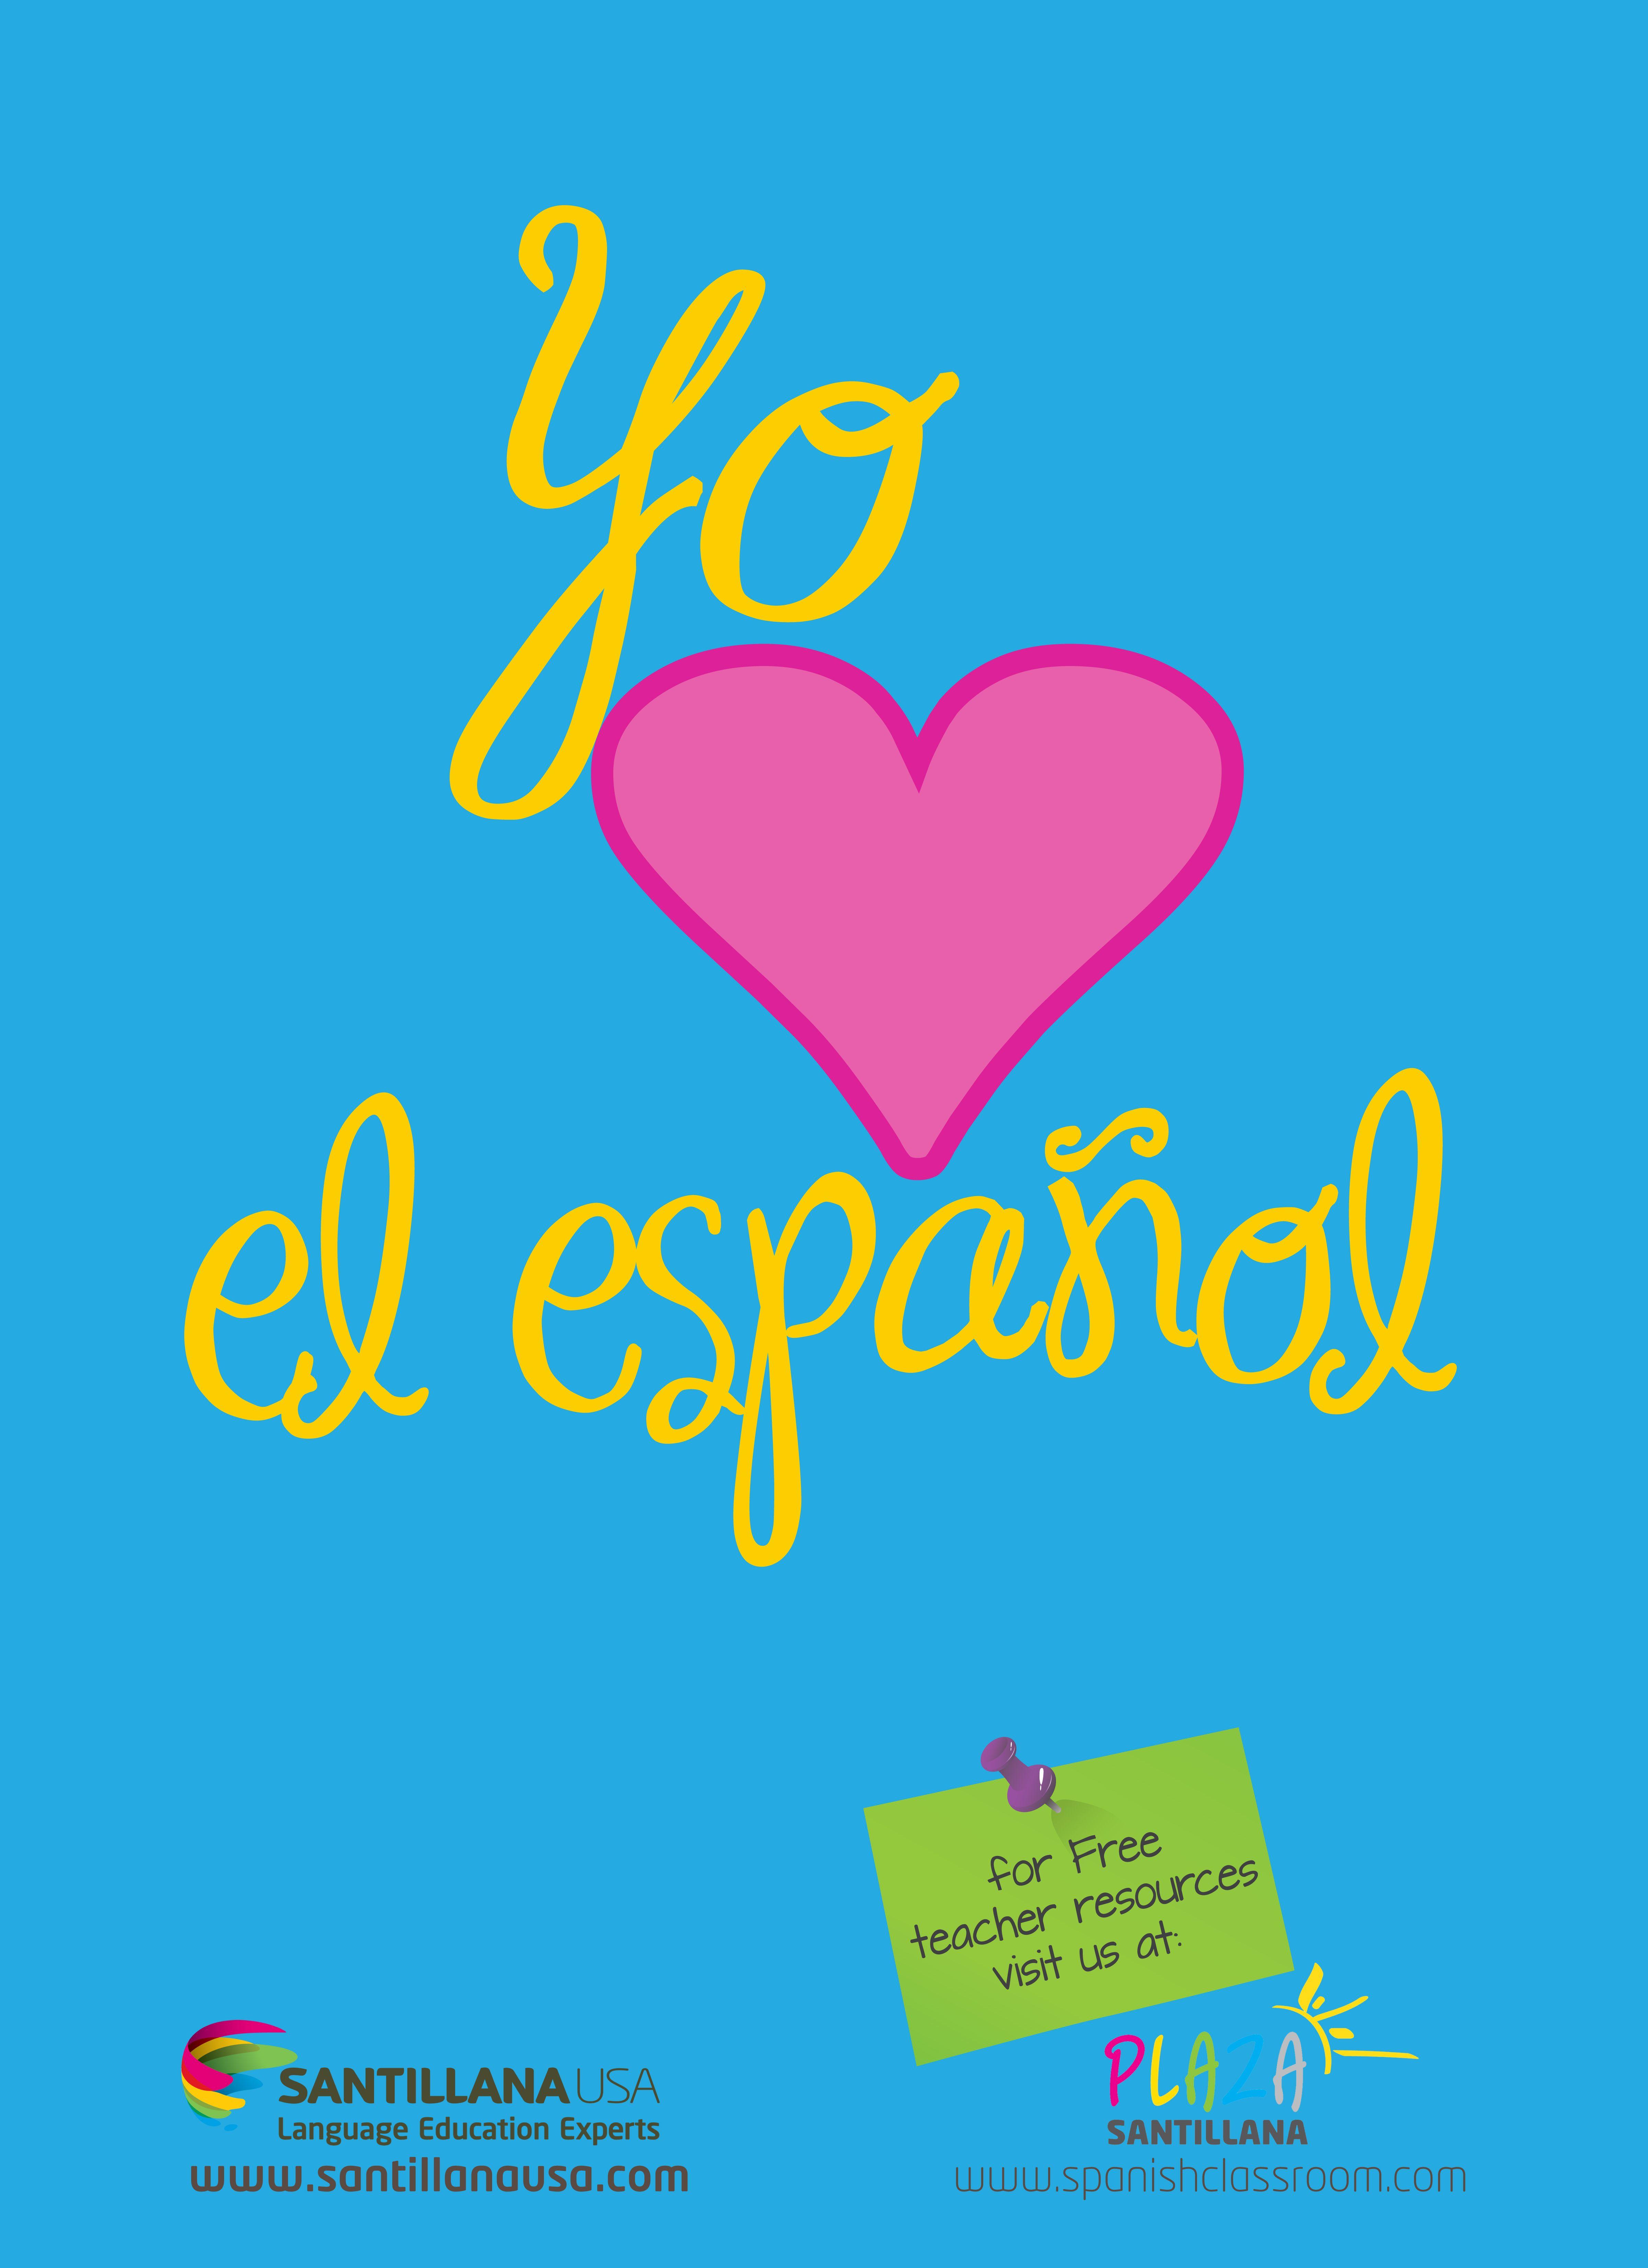 Plaza Santillana | Spanish classroom, Teaching spanish, Middle school  resources